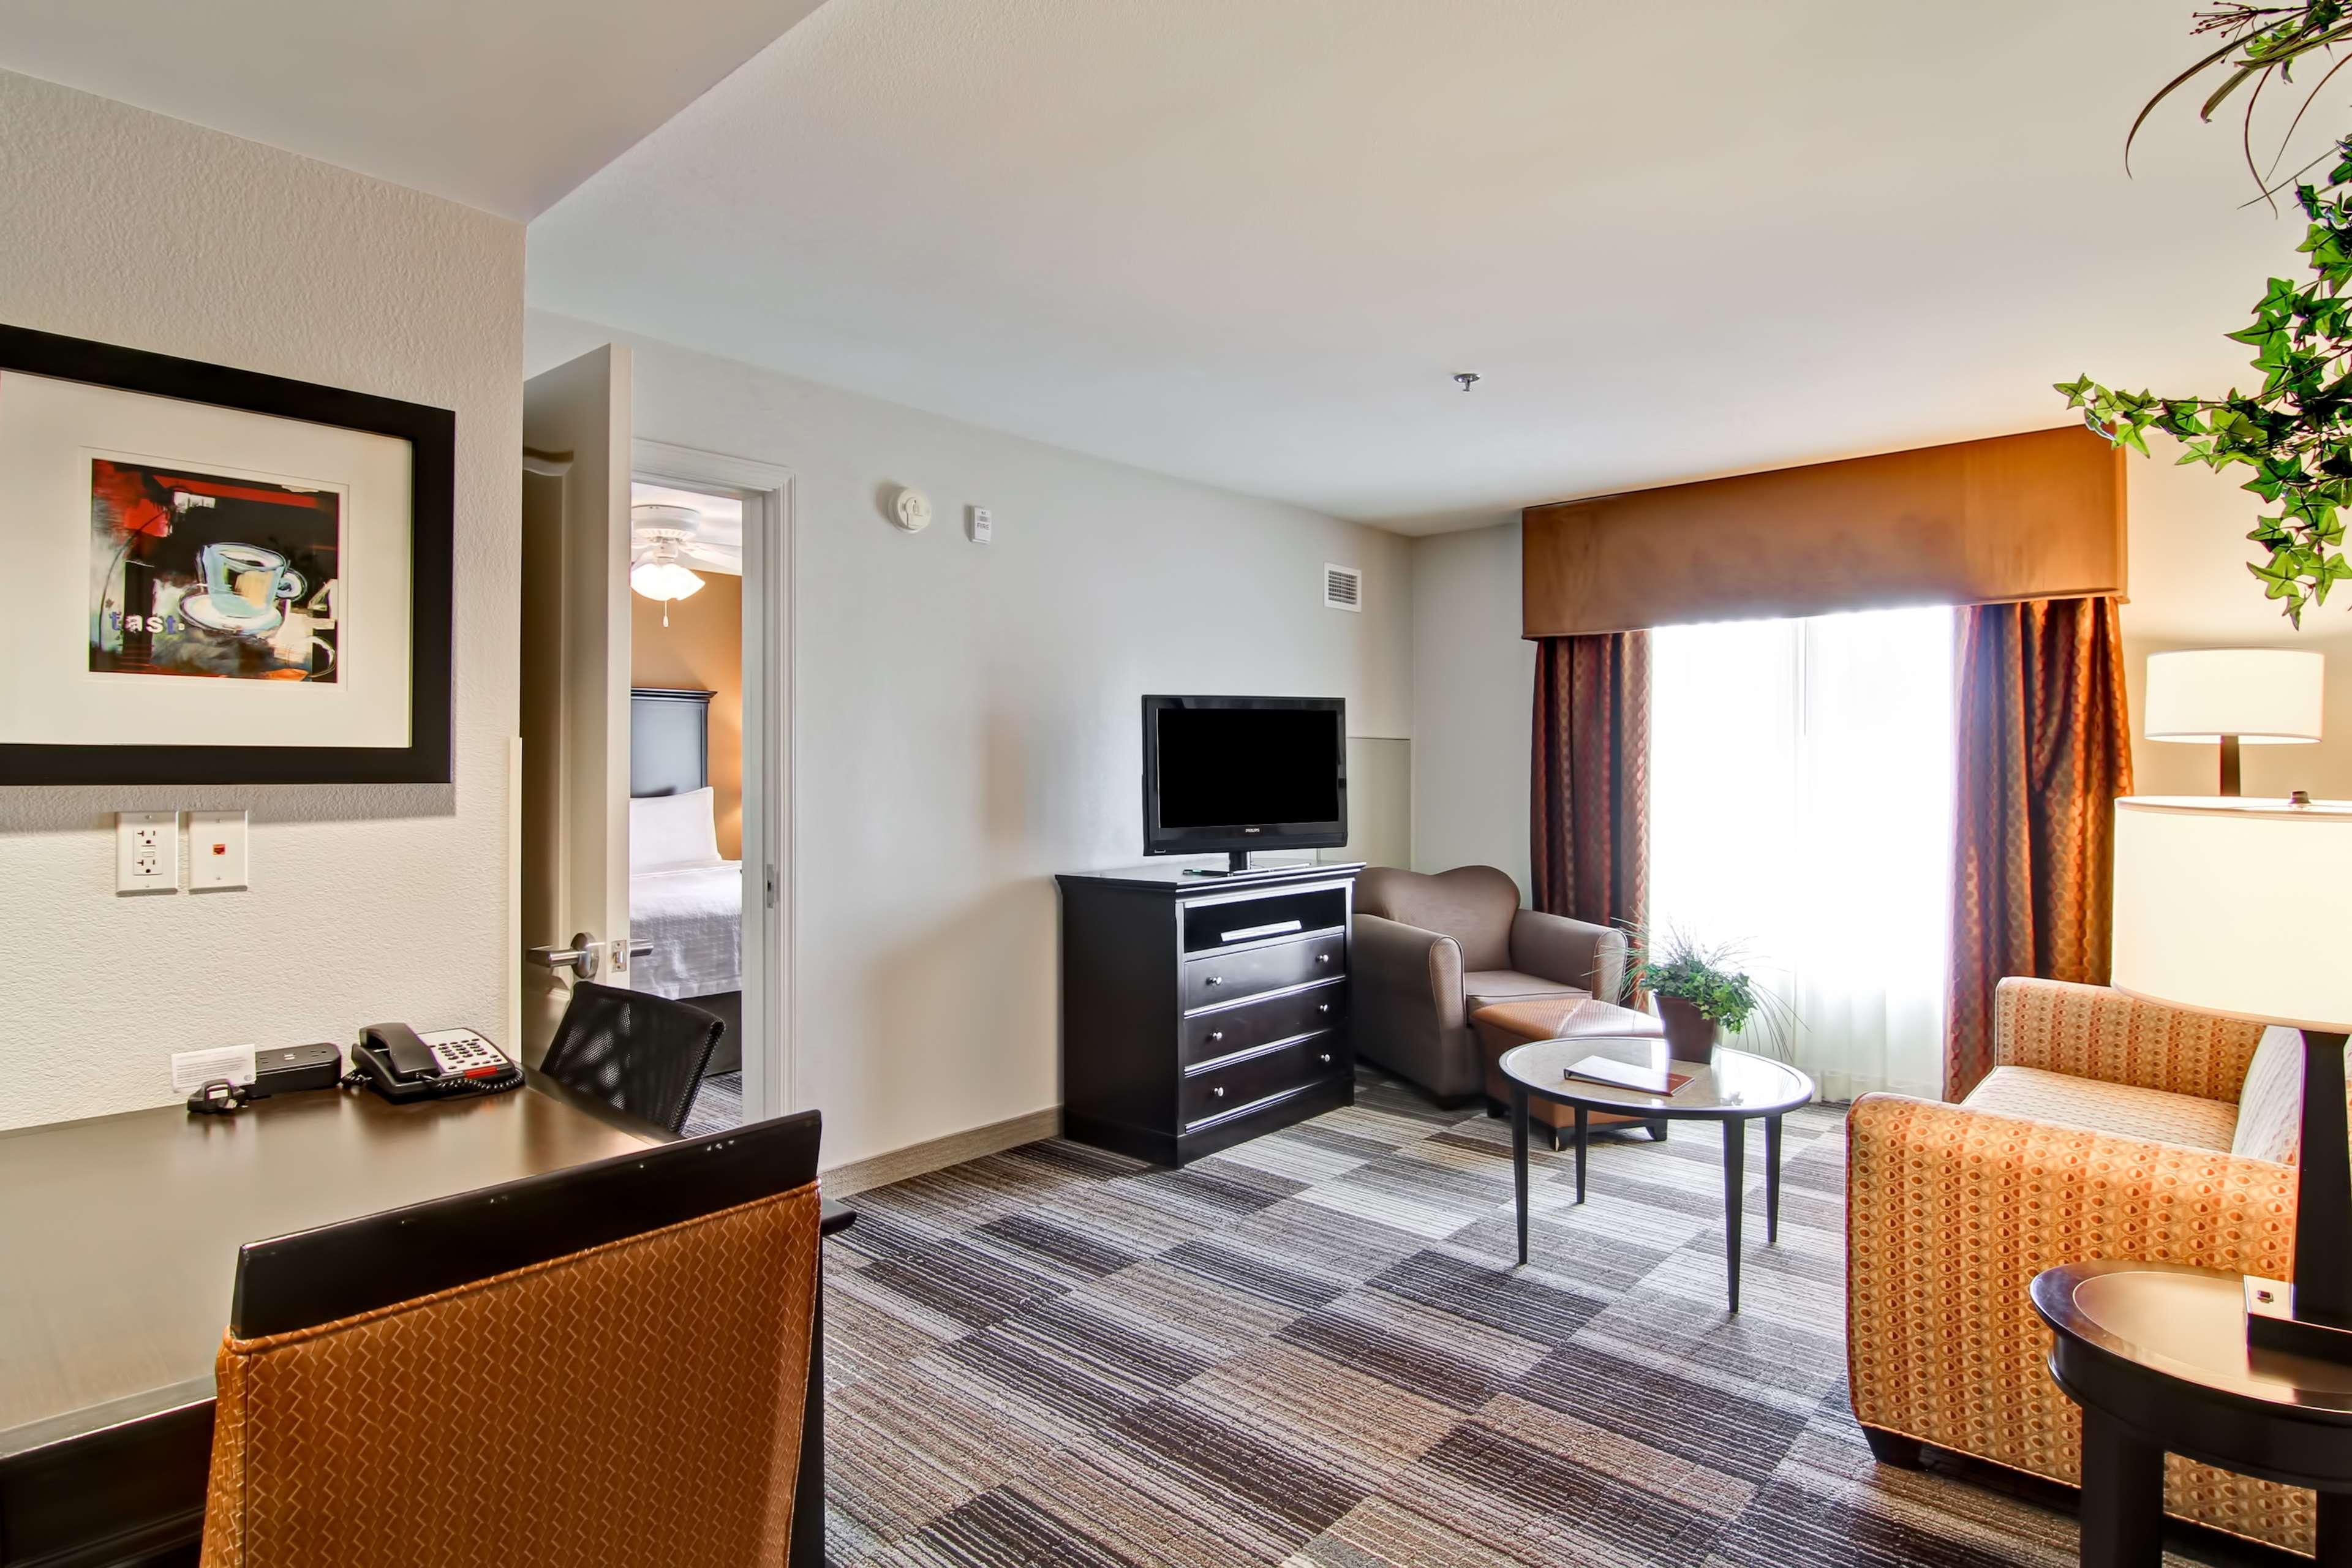 Homewood Suites by Hilton Cincinnati Airport South-Florence image 25